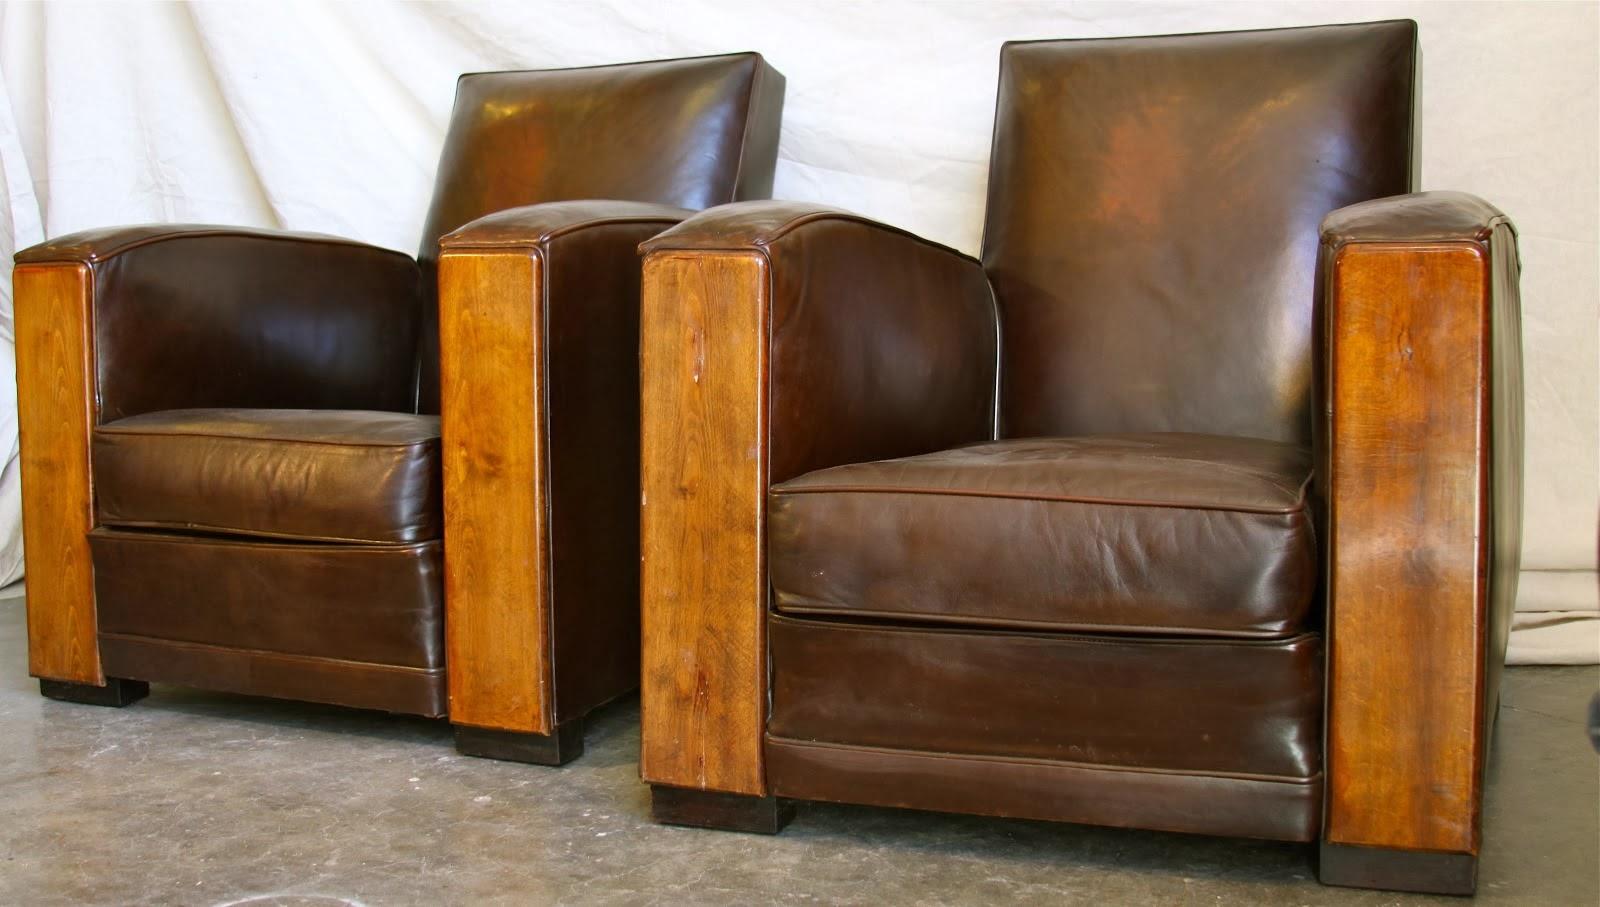 Fauteuil club cuir transformer votre chambre fauteuil main for Fauteuil cuir club